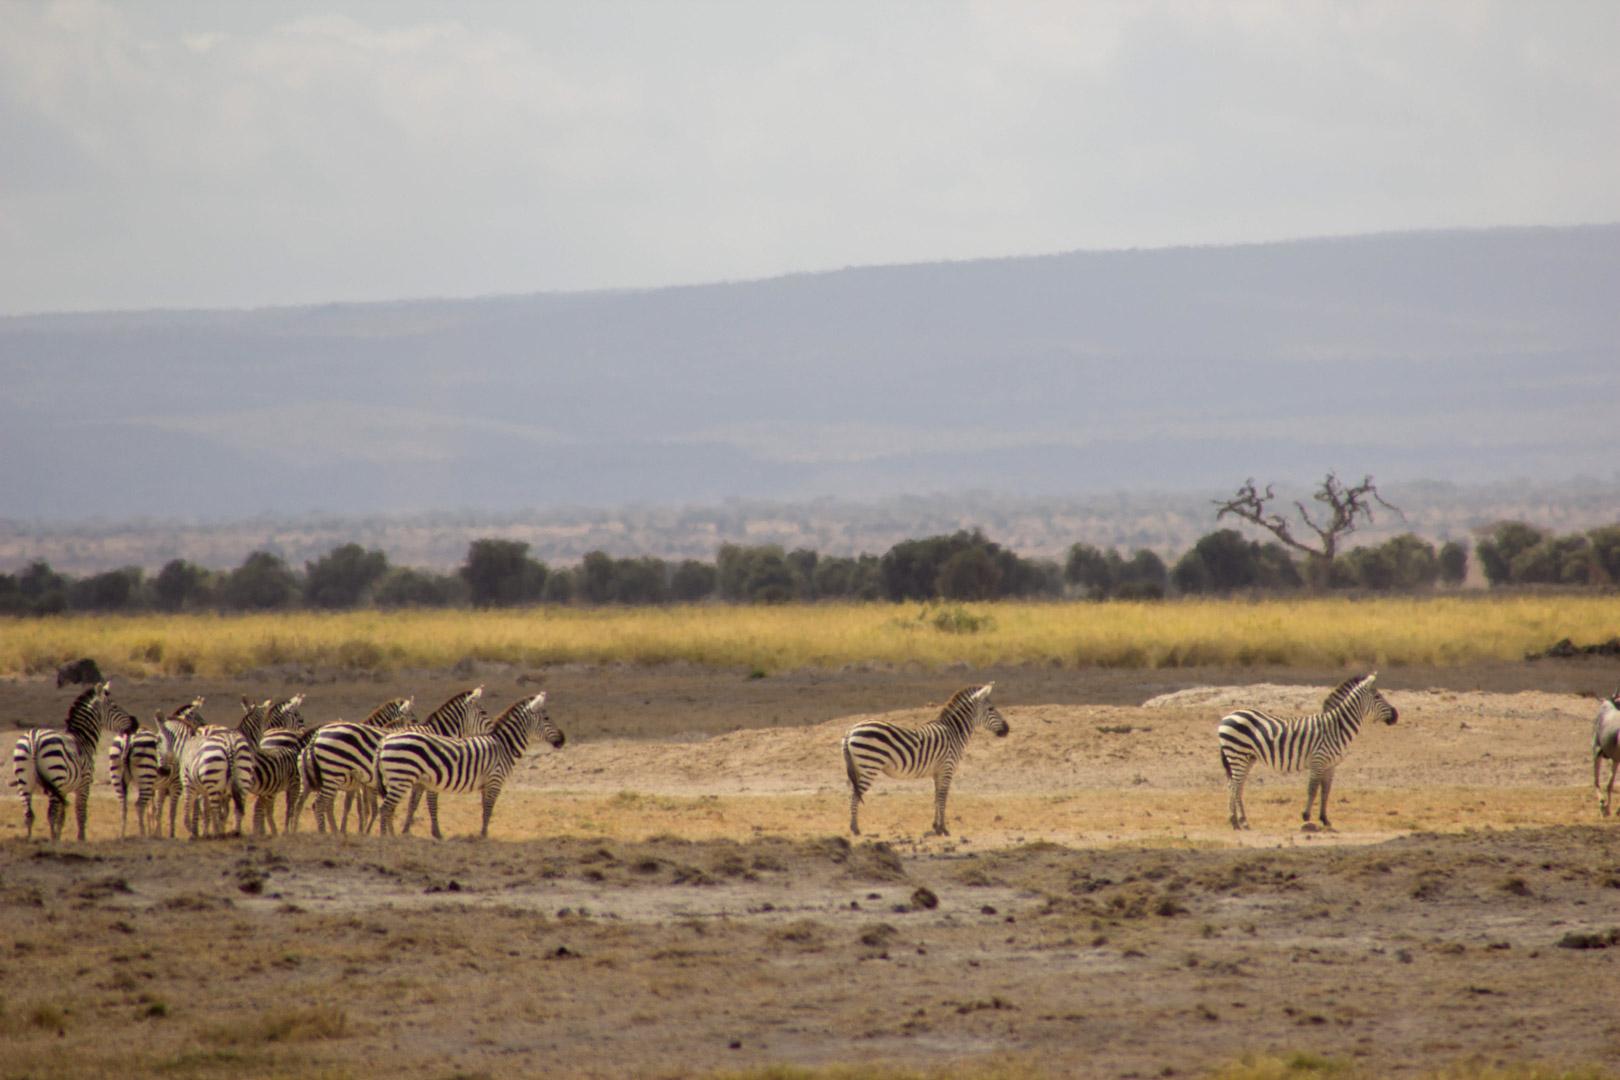 Cebras inmóviles observando al león, Amboseli, Kenia